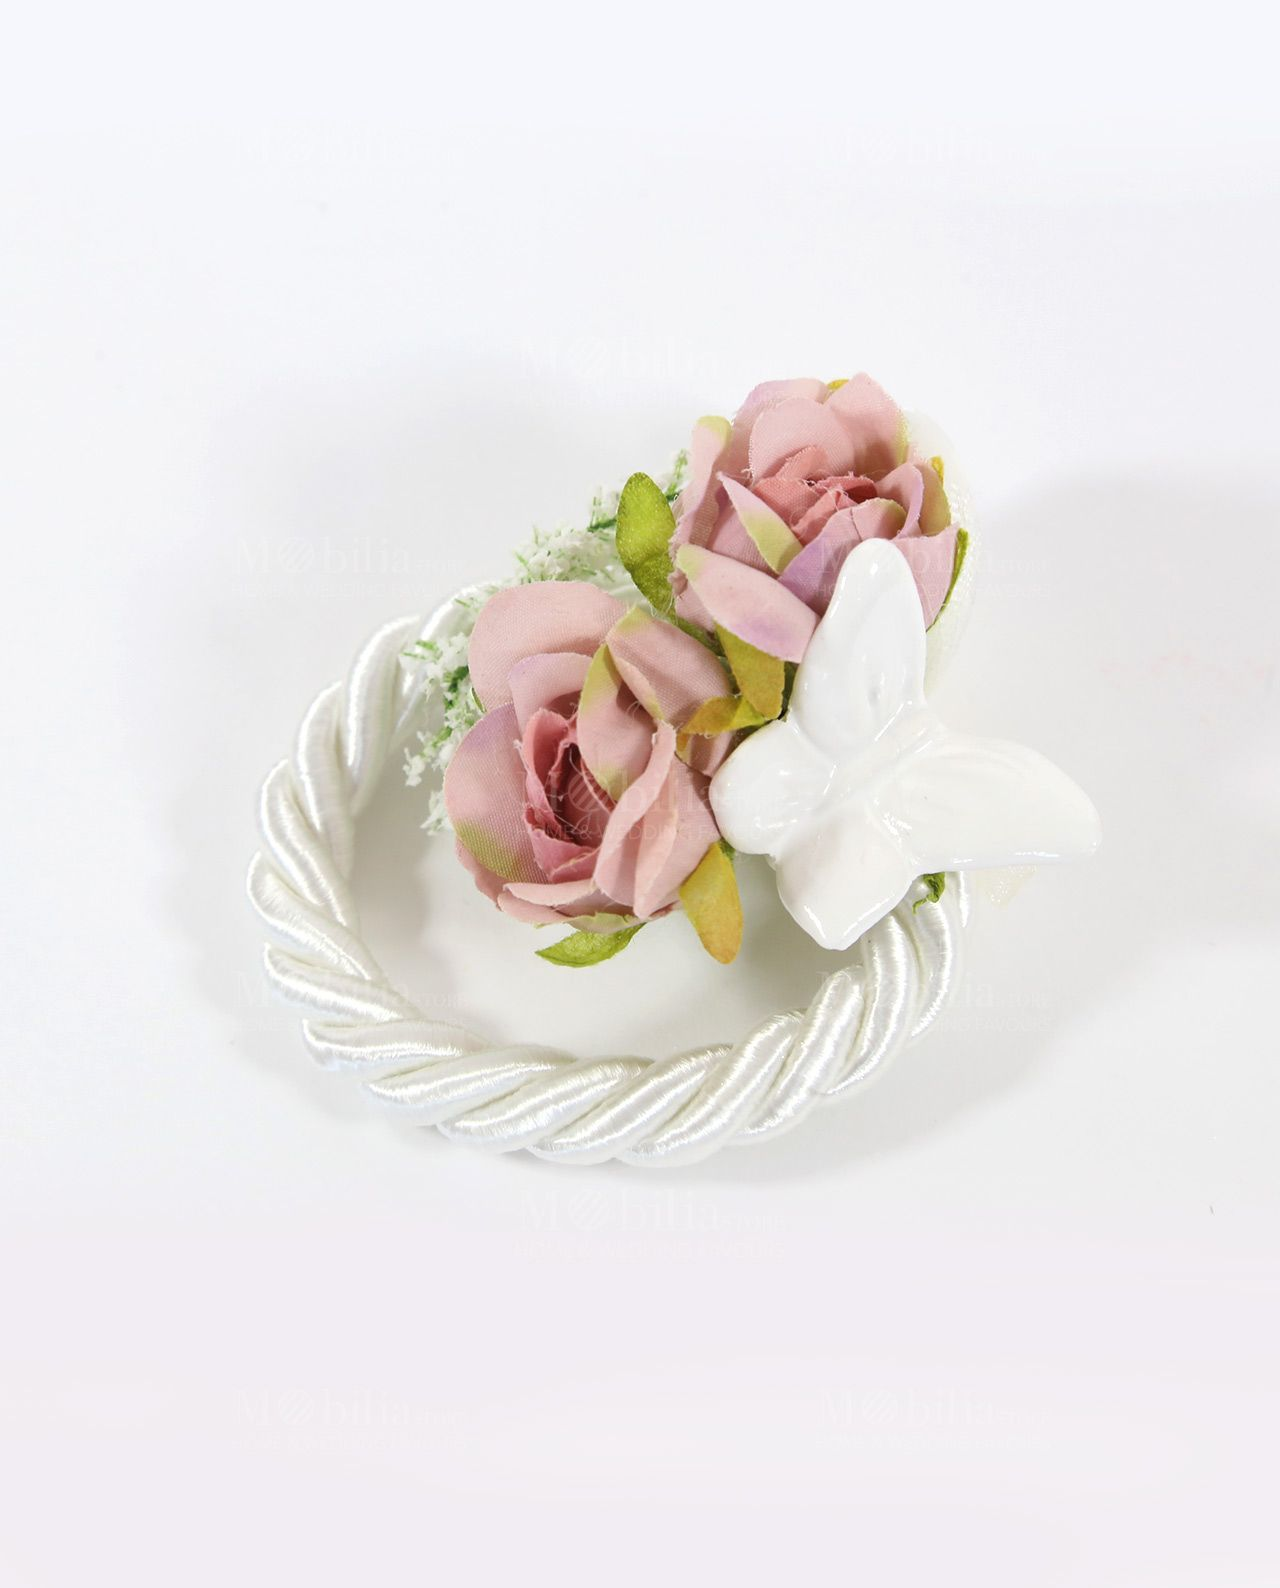 Segnaposto Matrimonio Con Farfalle.Segnaposto Shabby Chic Vintage Rose Rdm Design Segnaposto